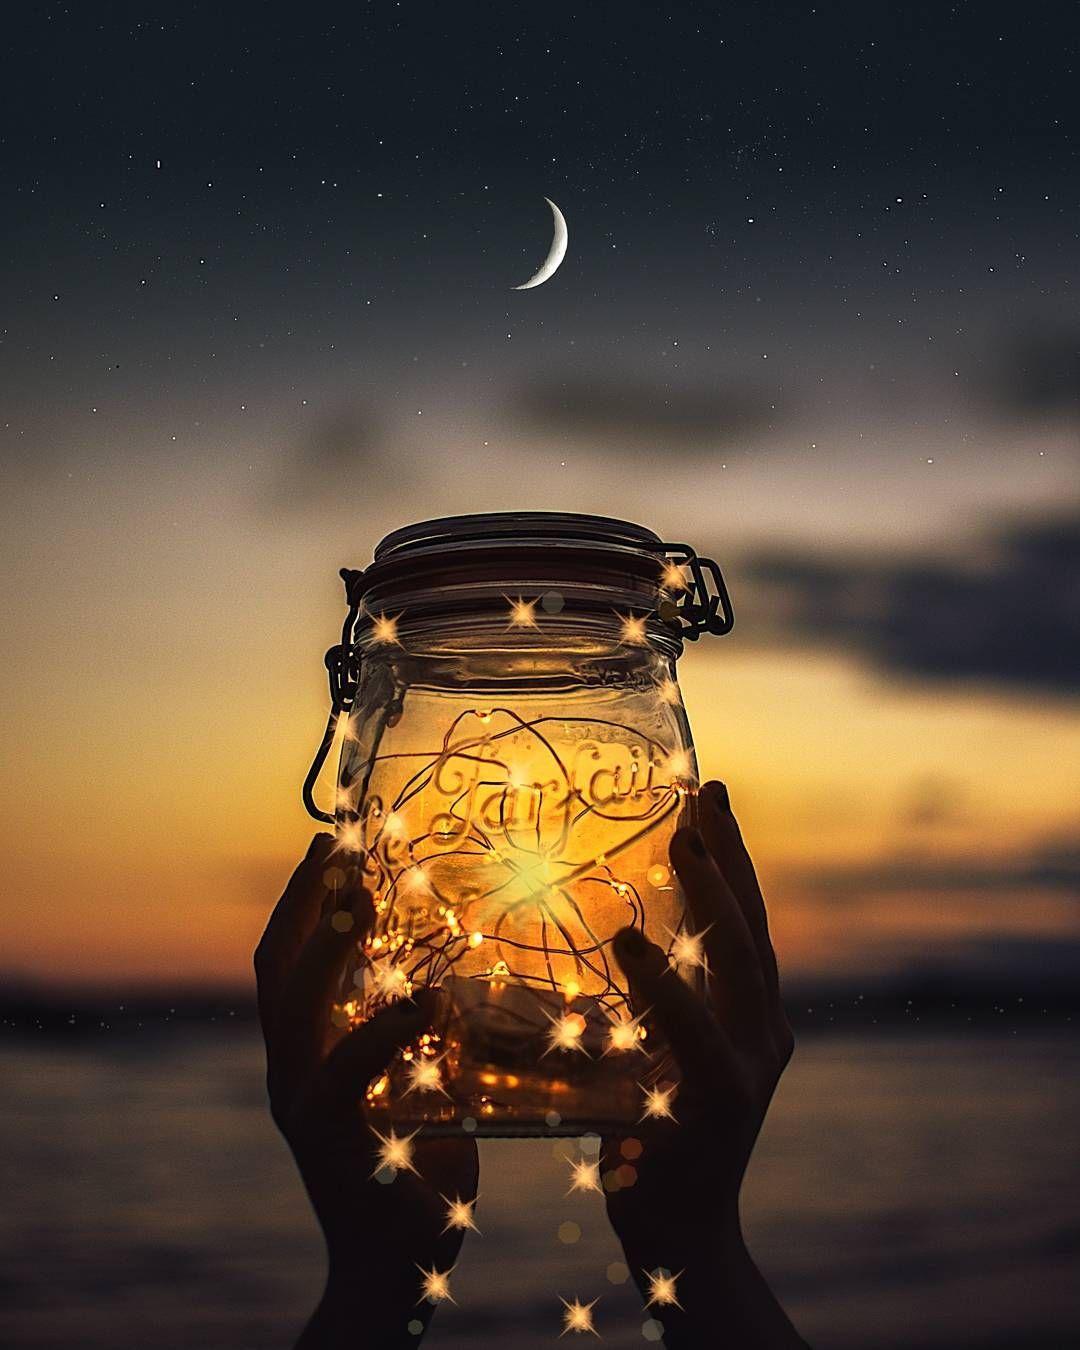 "-: Summer Shine :- "". . . Fireflies On Summer Nights"